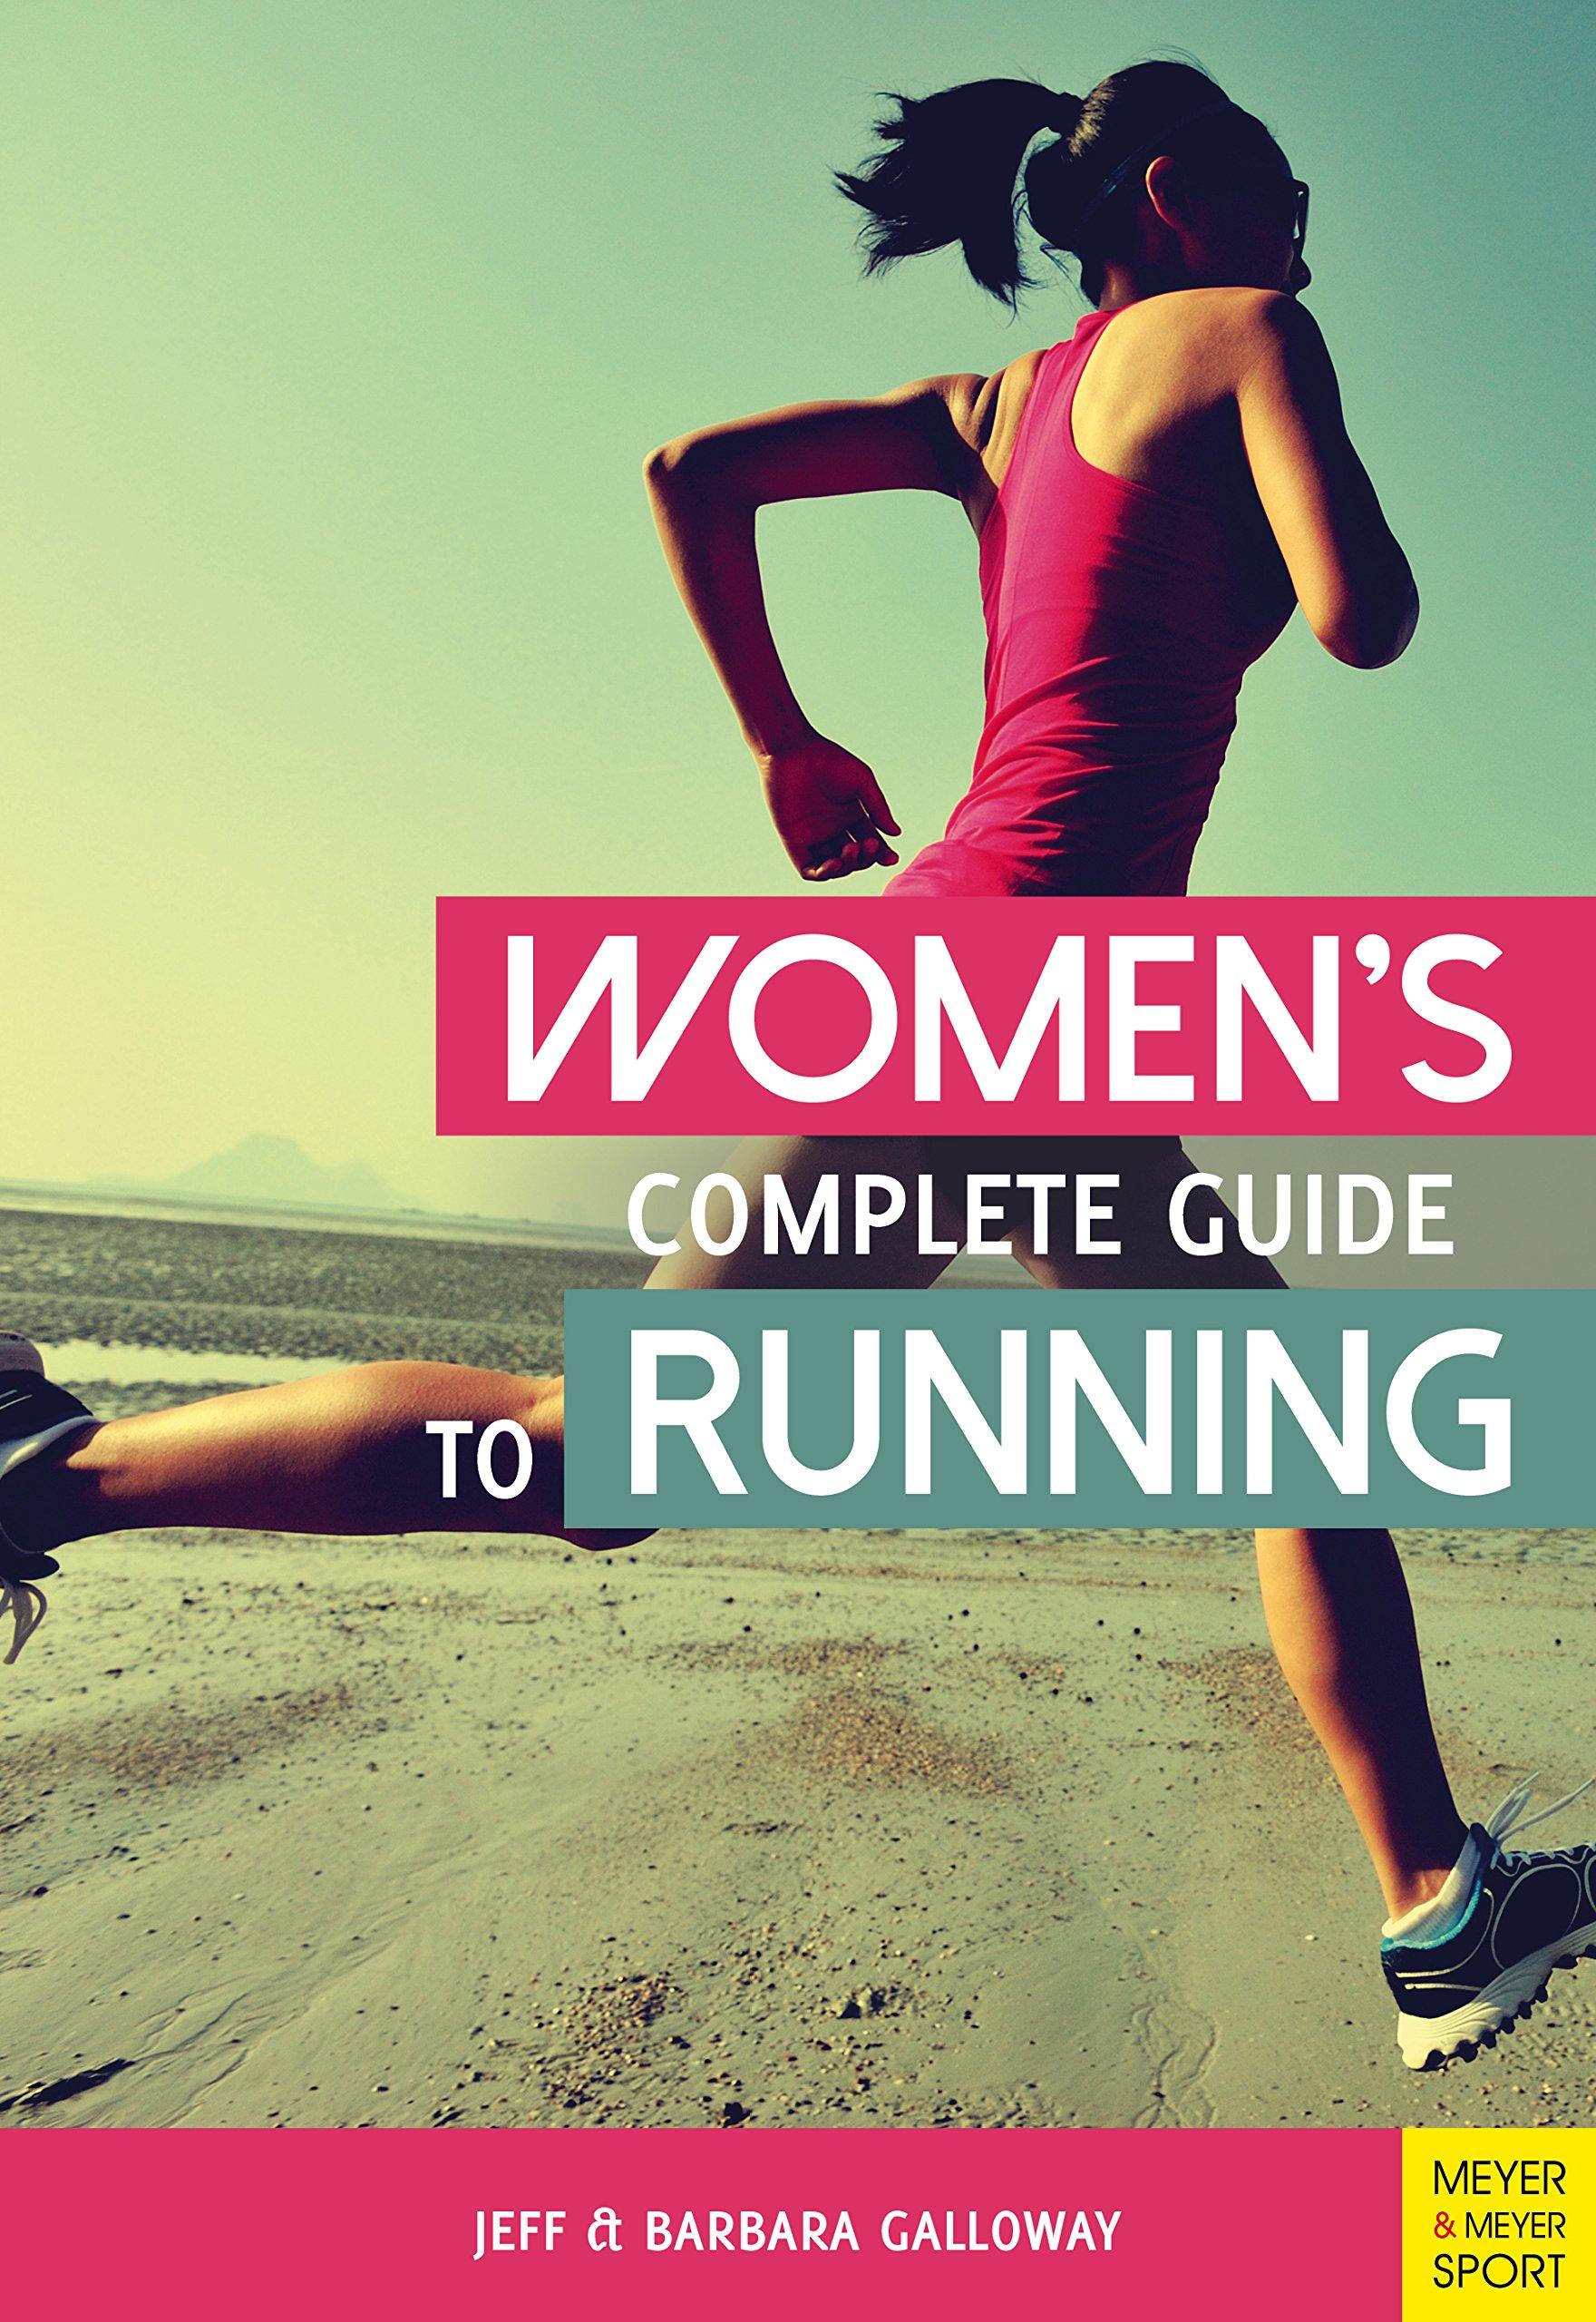 Women's Complete Guide to Running: Amazon.co.uk: Jeff Galloway, Barbara  Galloway: 9781782551485: Books